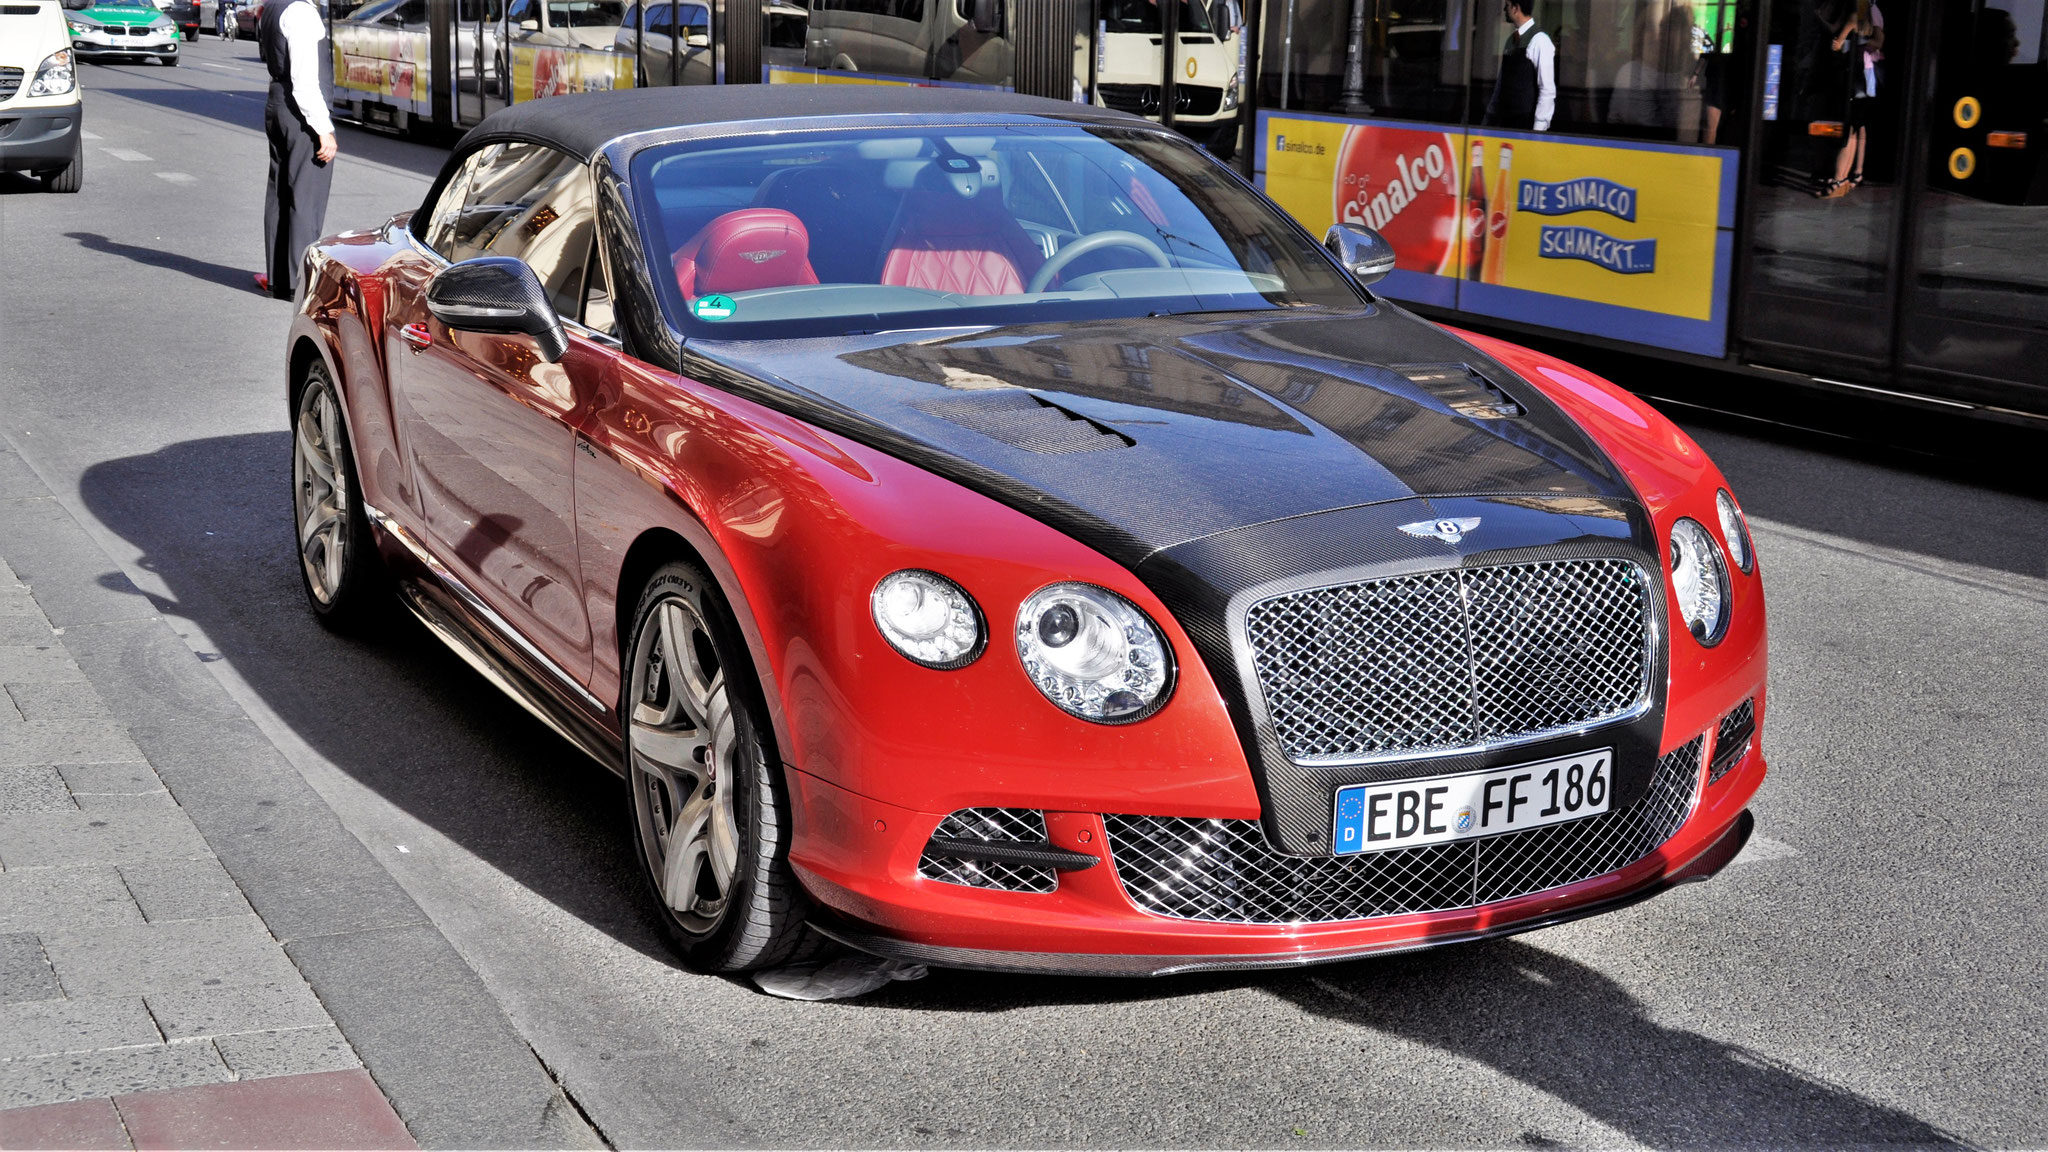 Bentley Continental GTC Speed - EBE-FF-186